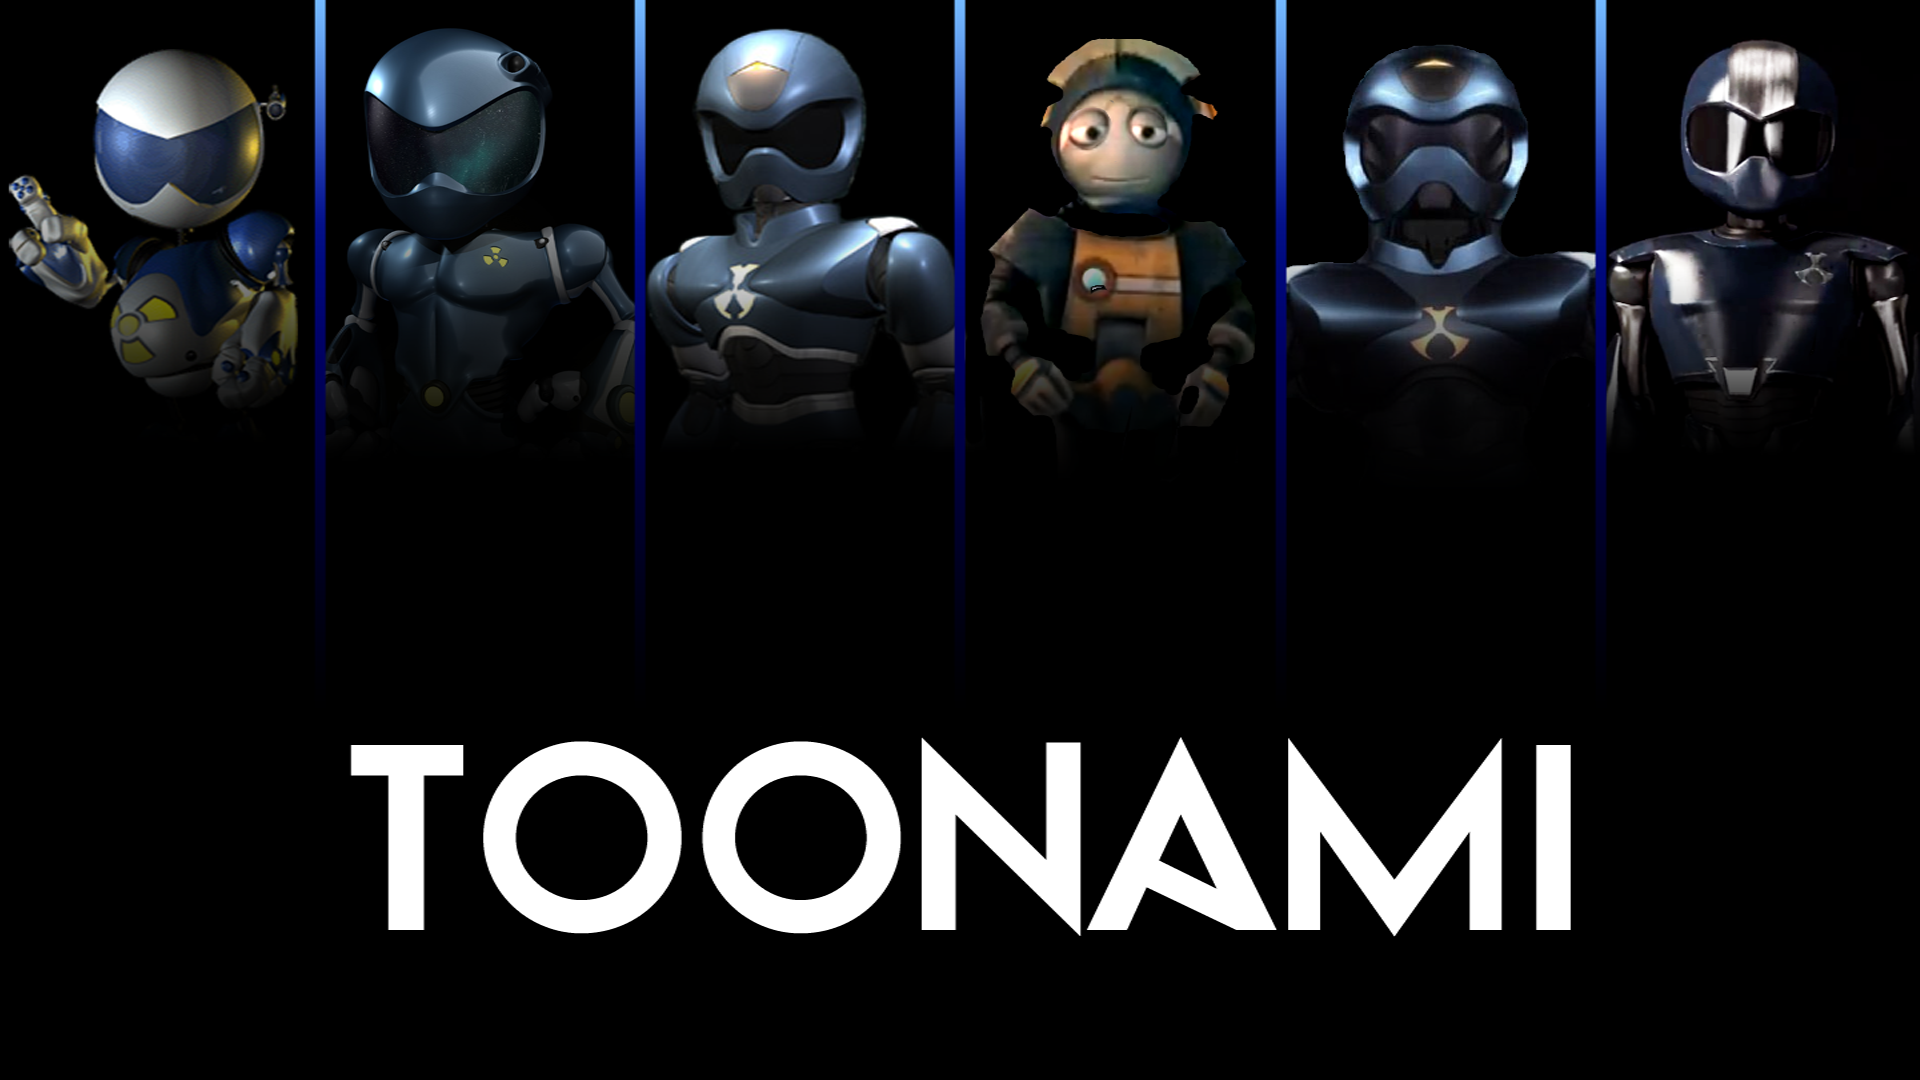 Toonami Goodies by Raffian